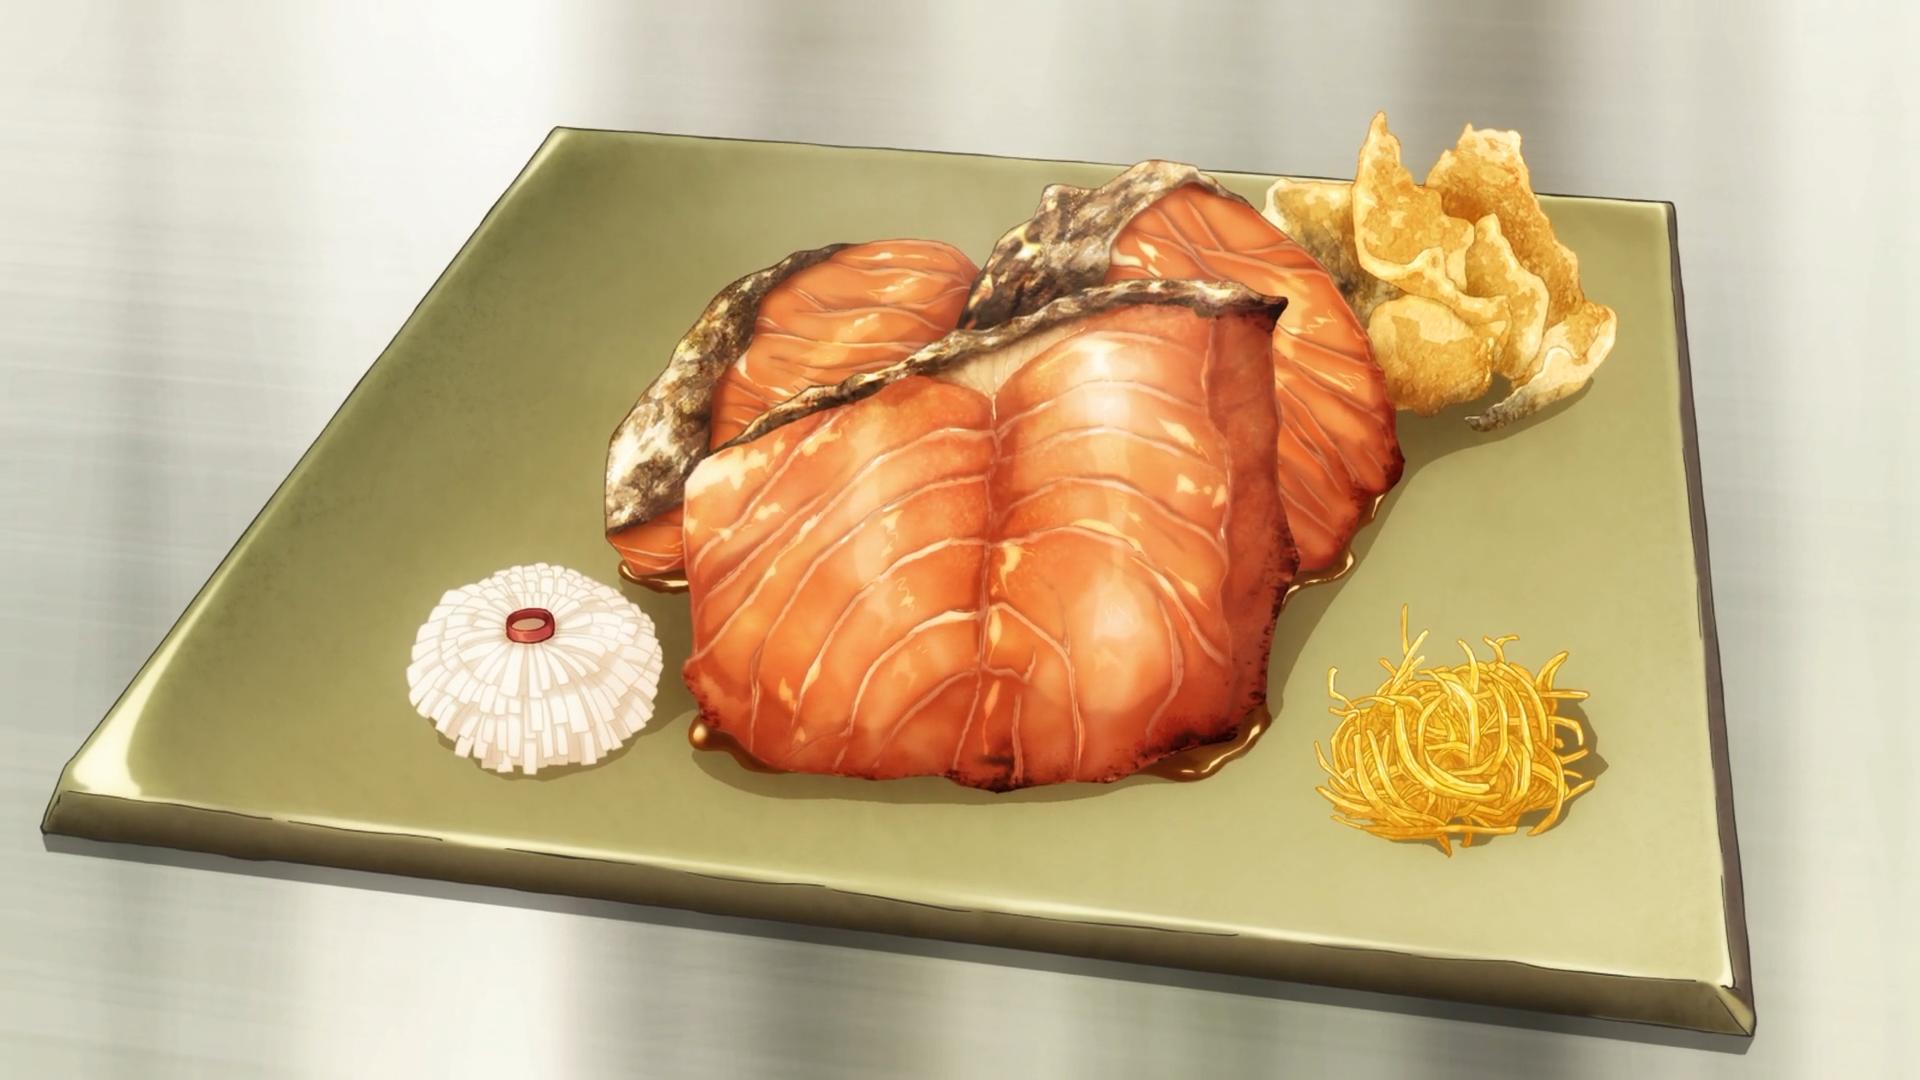 yuanstyle grilled tokishirazu shokugeki no soma wiki